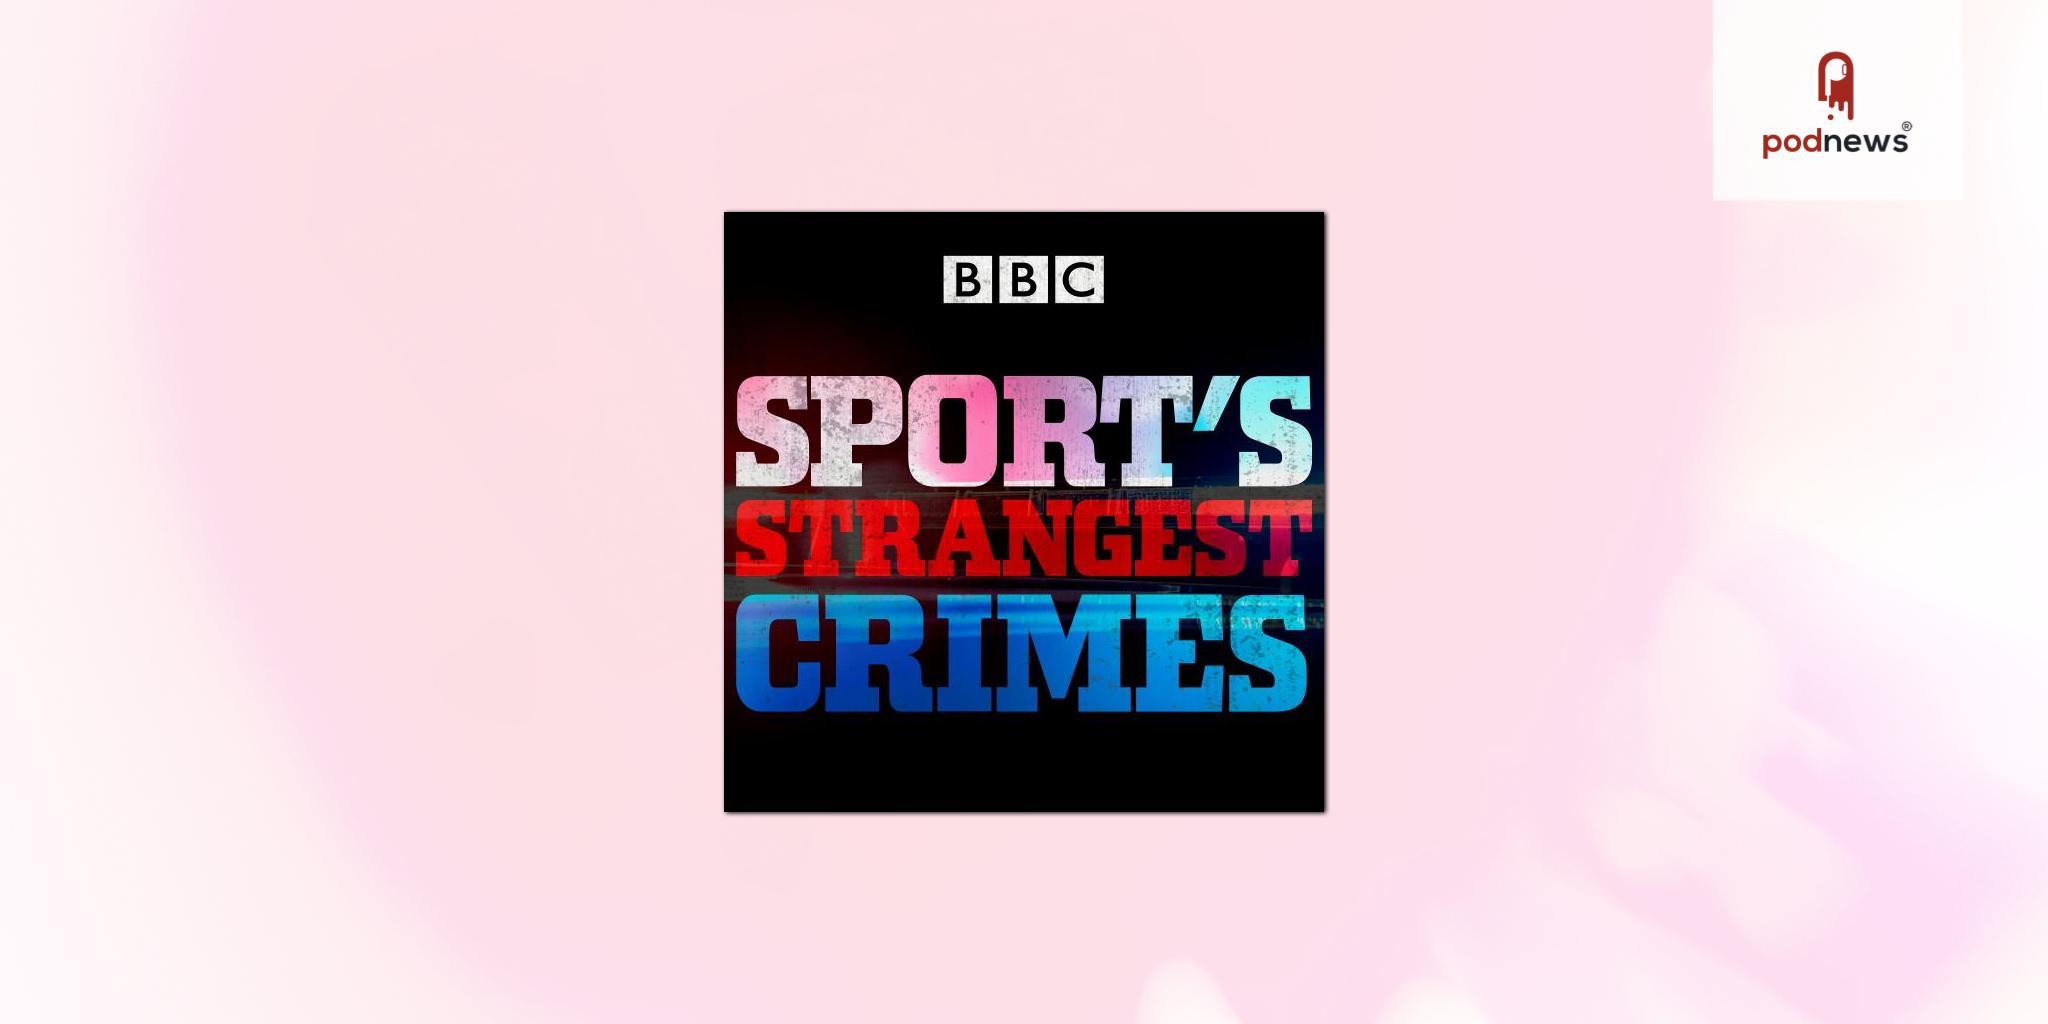 Sport's Strangest Crimes returns to BBC Sounds with Greg James investigating Allen Stanford